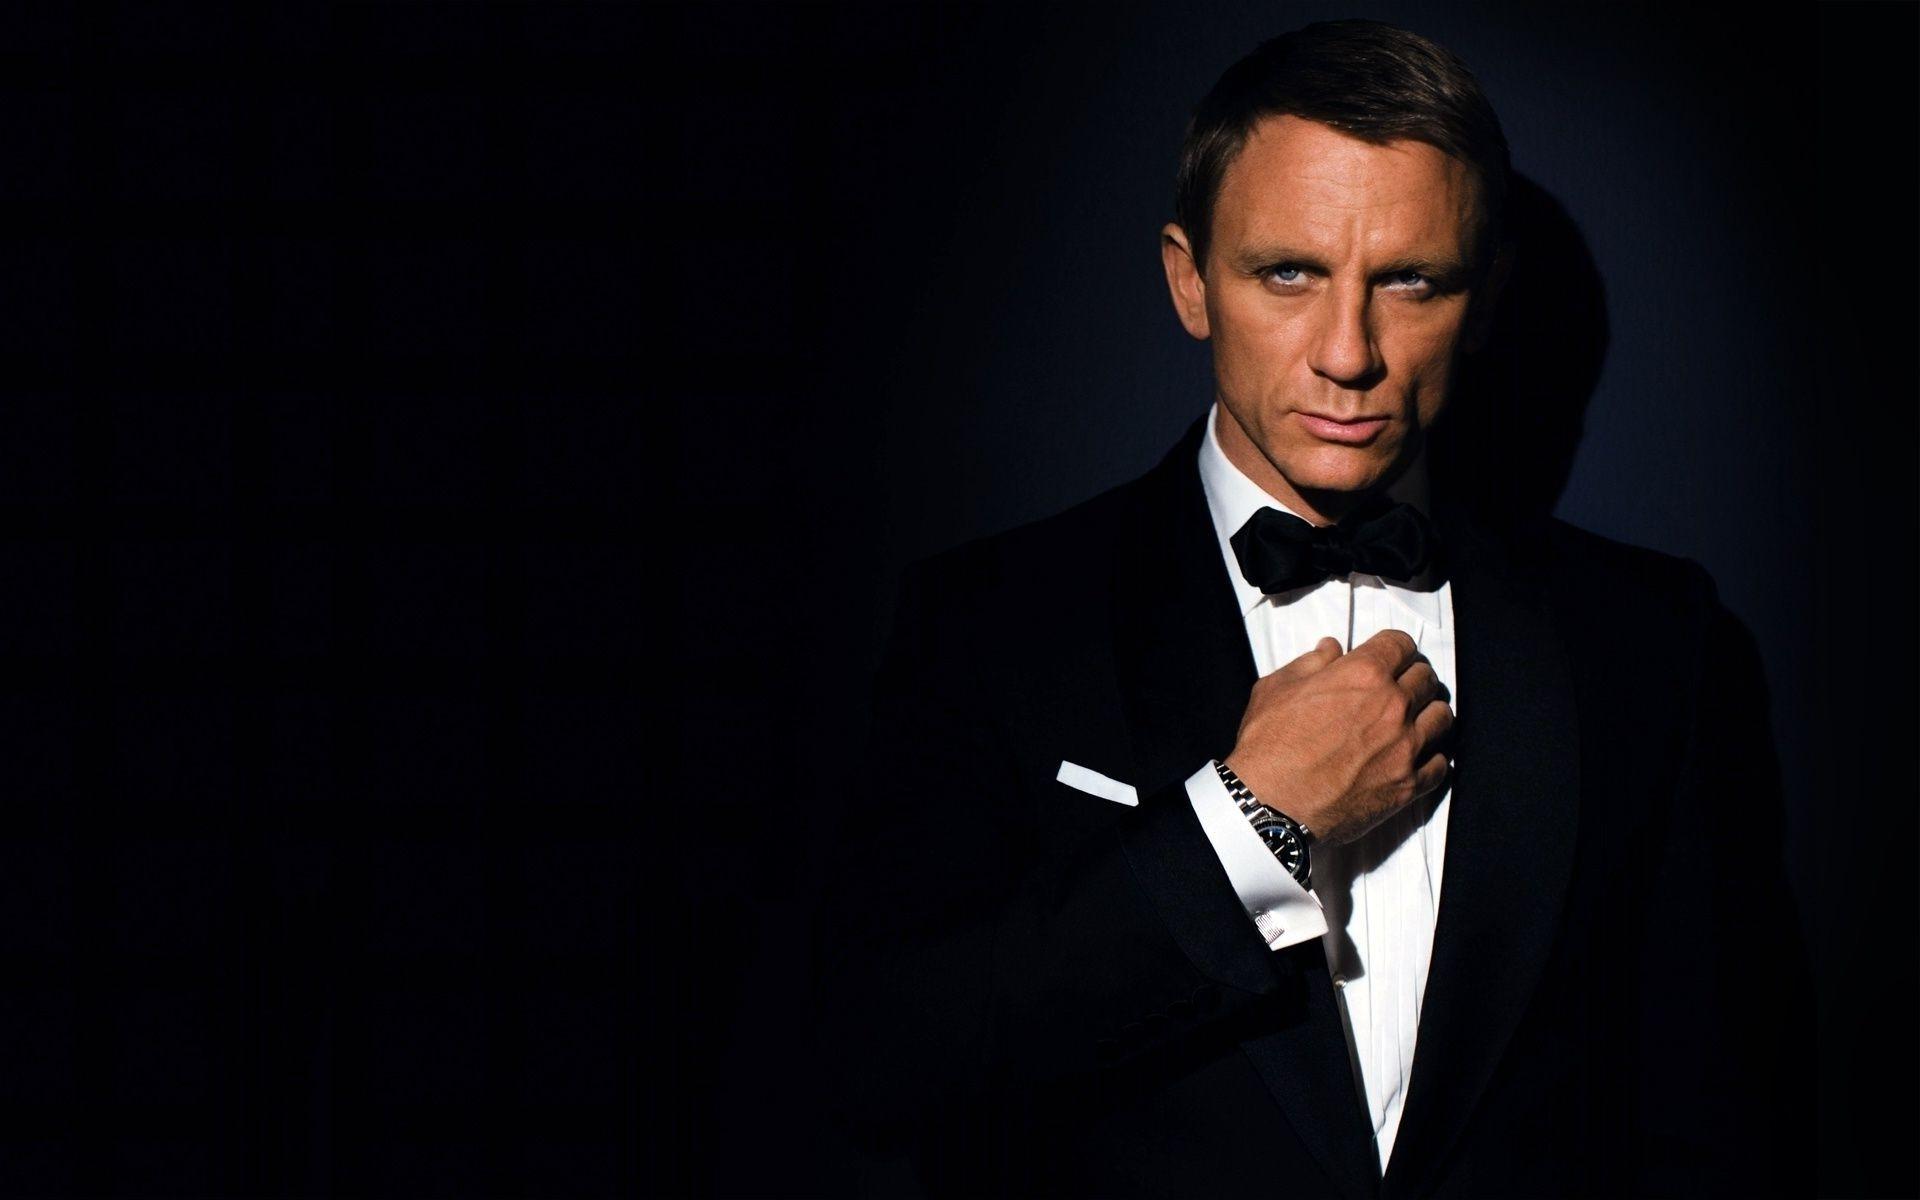 The Suit James Bond Actor Daniel Craig Man 007 Android Wallpapers